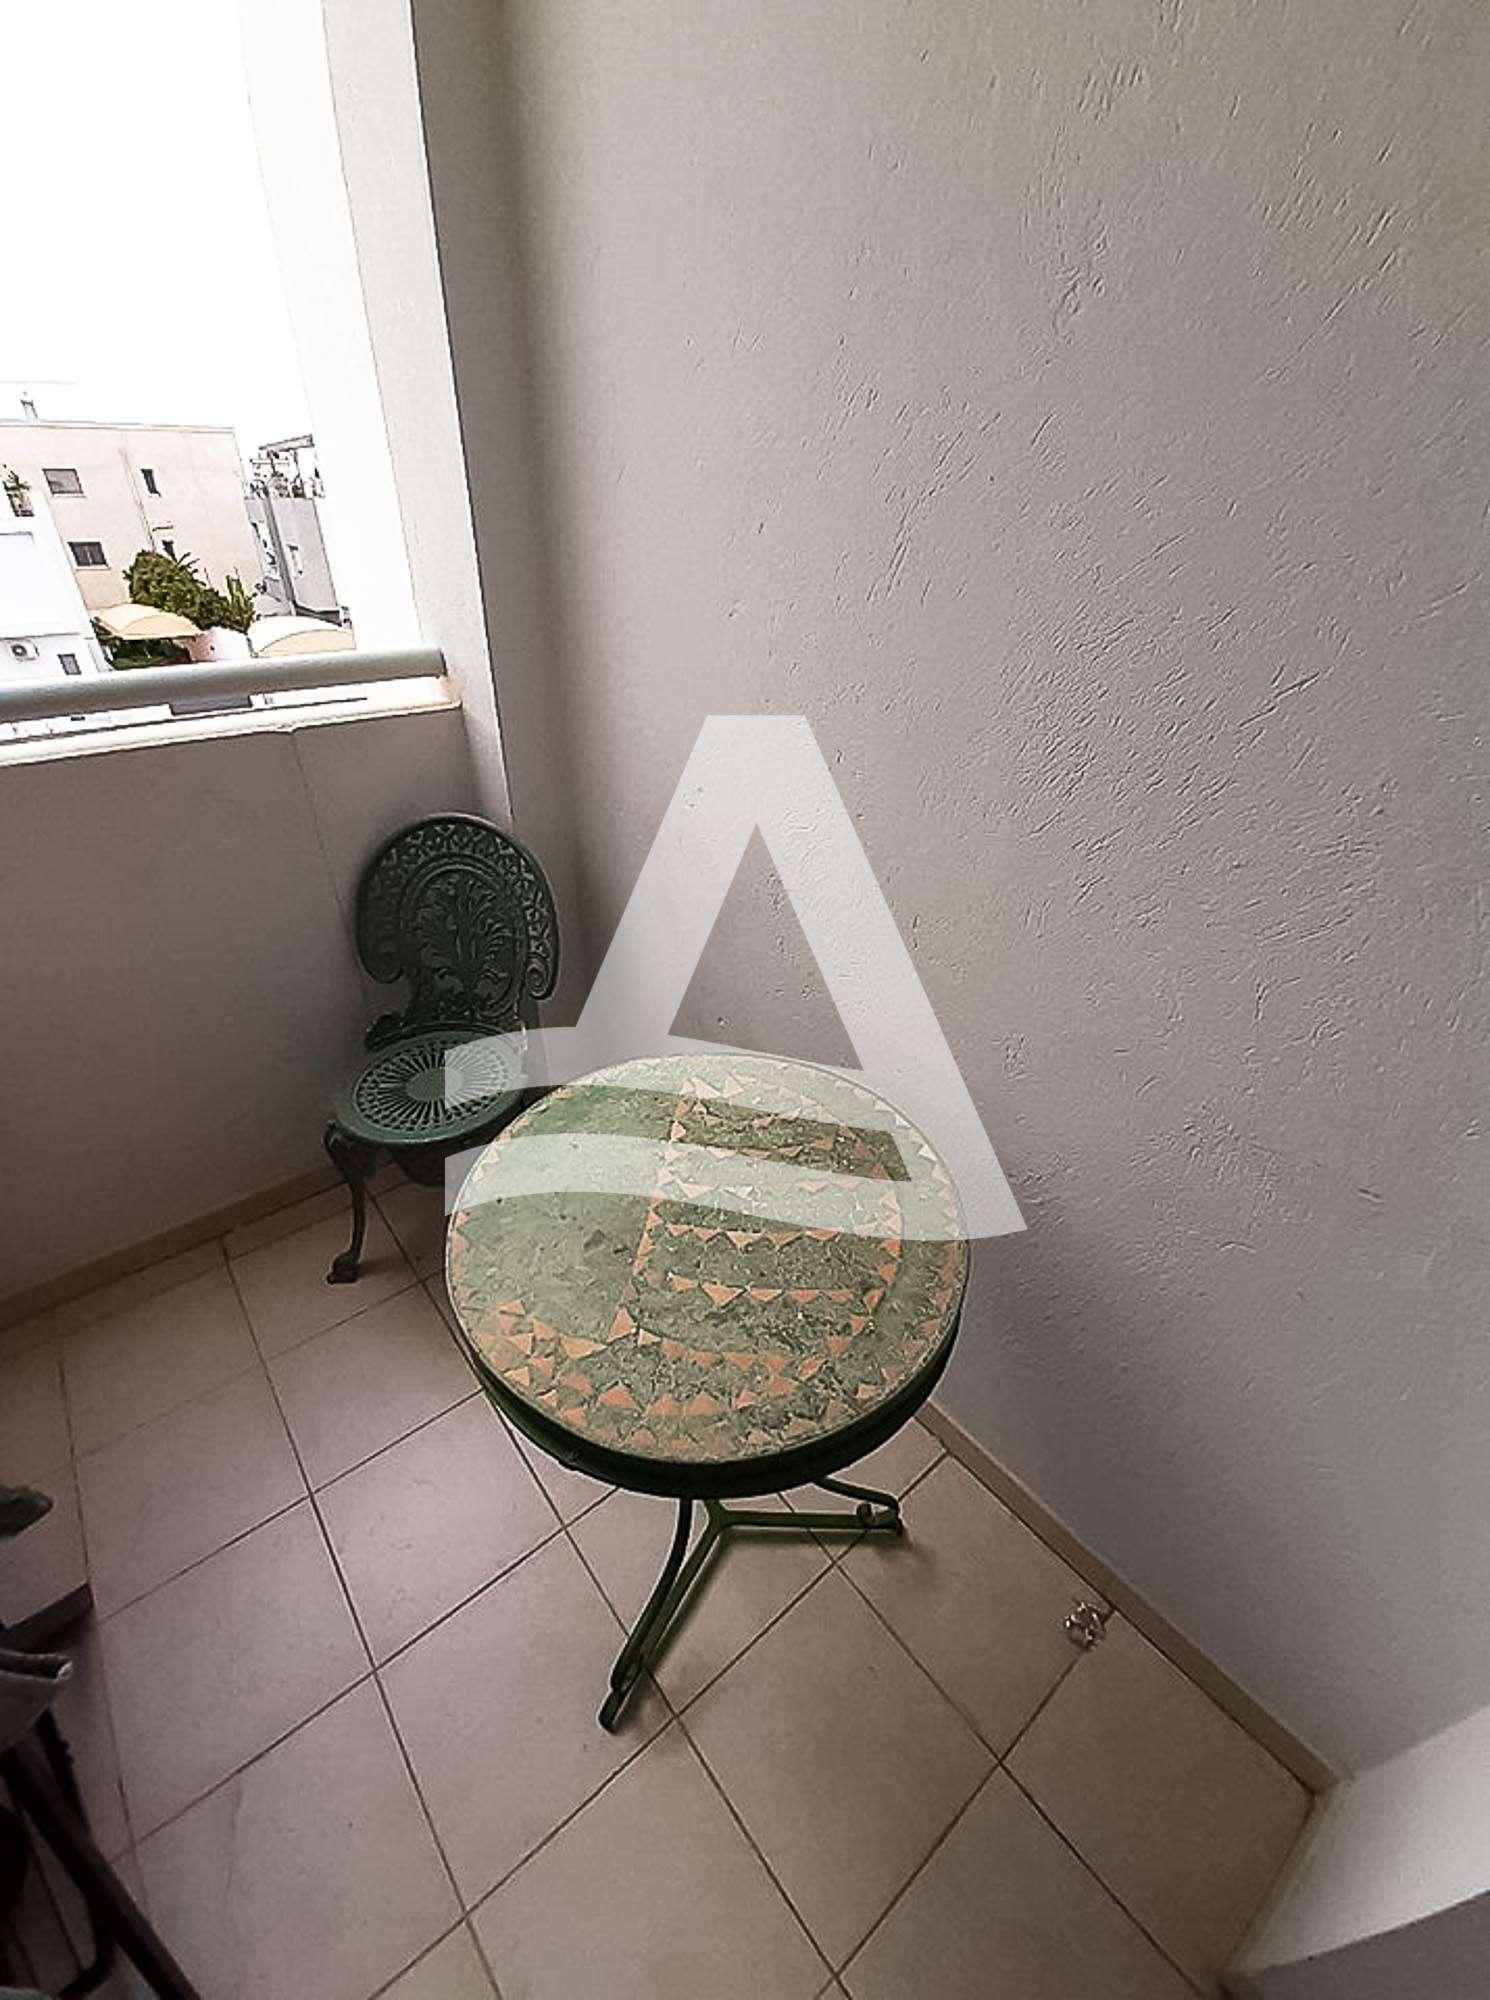 httpss3.amazonaws.comlogimoaws_Arcane_immobilière_la_Marsa-_location_-_vente_la_marsa_11_sur_16_1574071698436-1